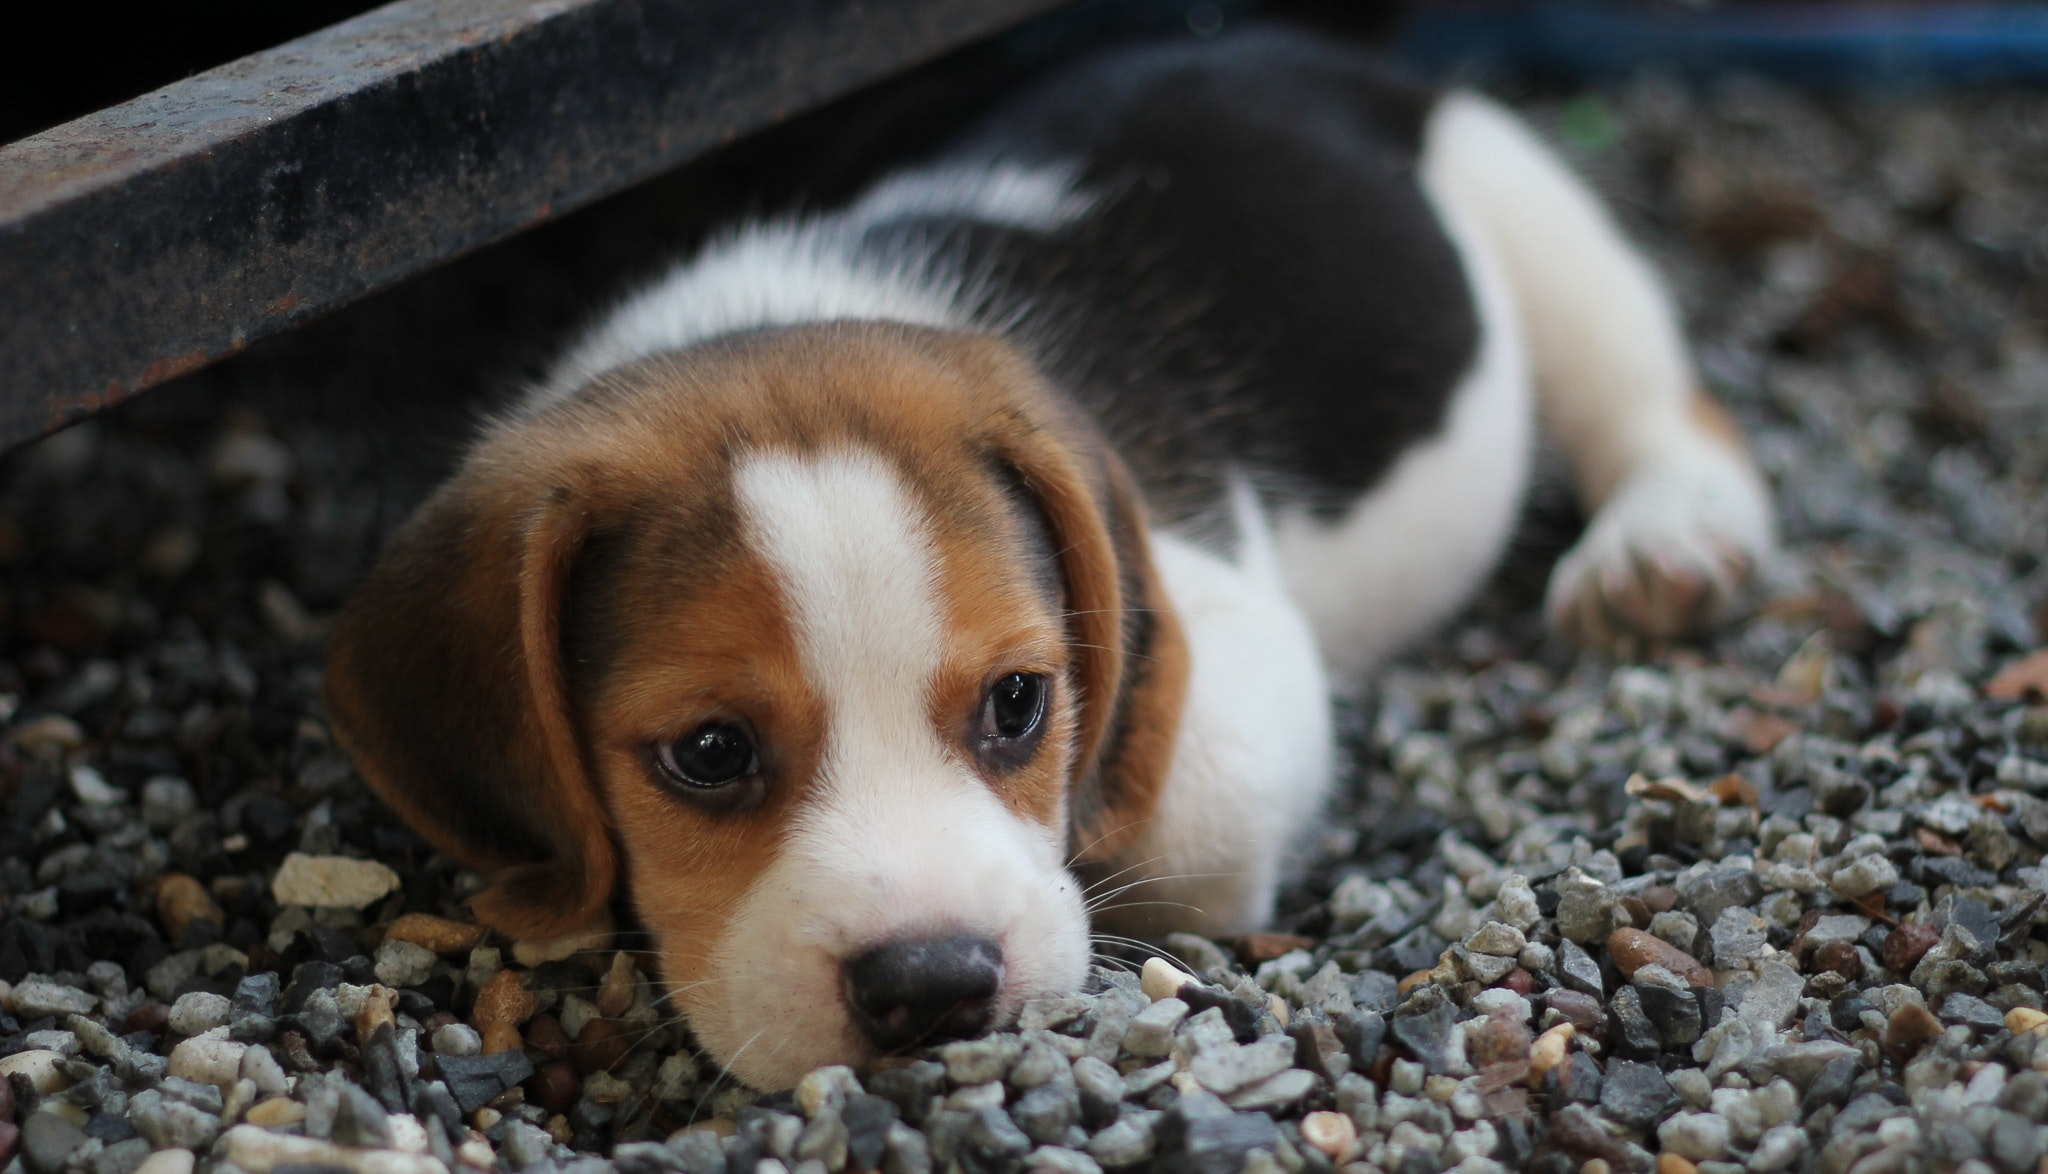 Dangers of dogs eating rocks